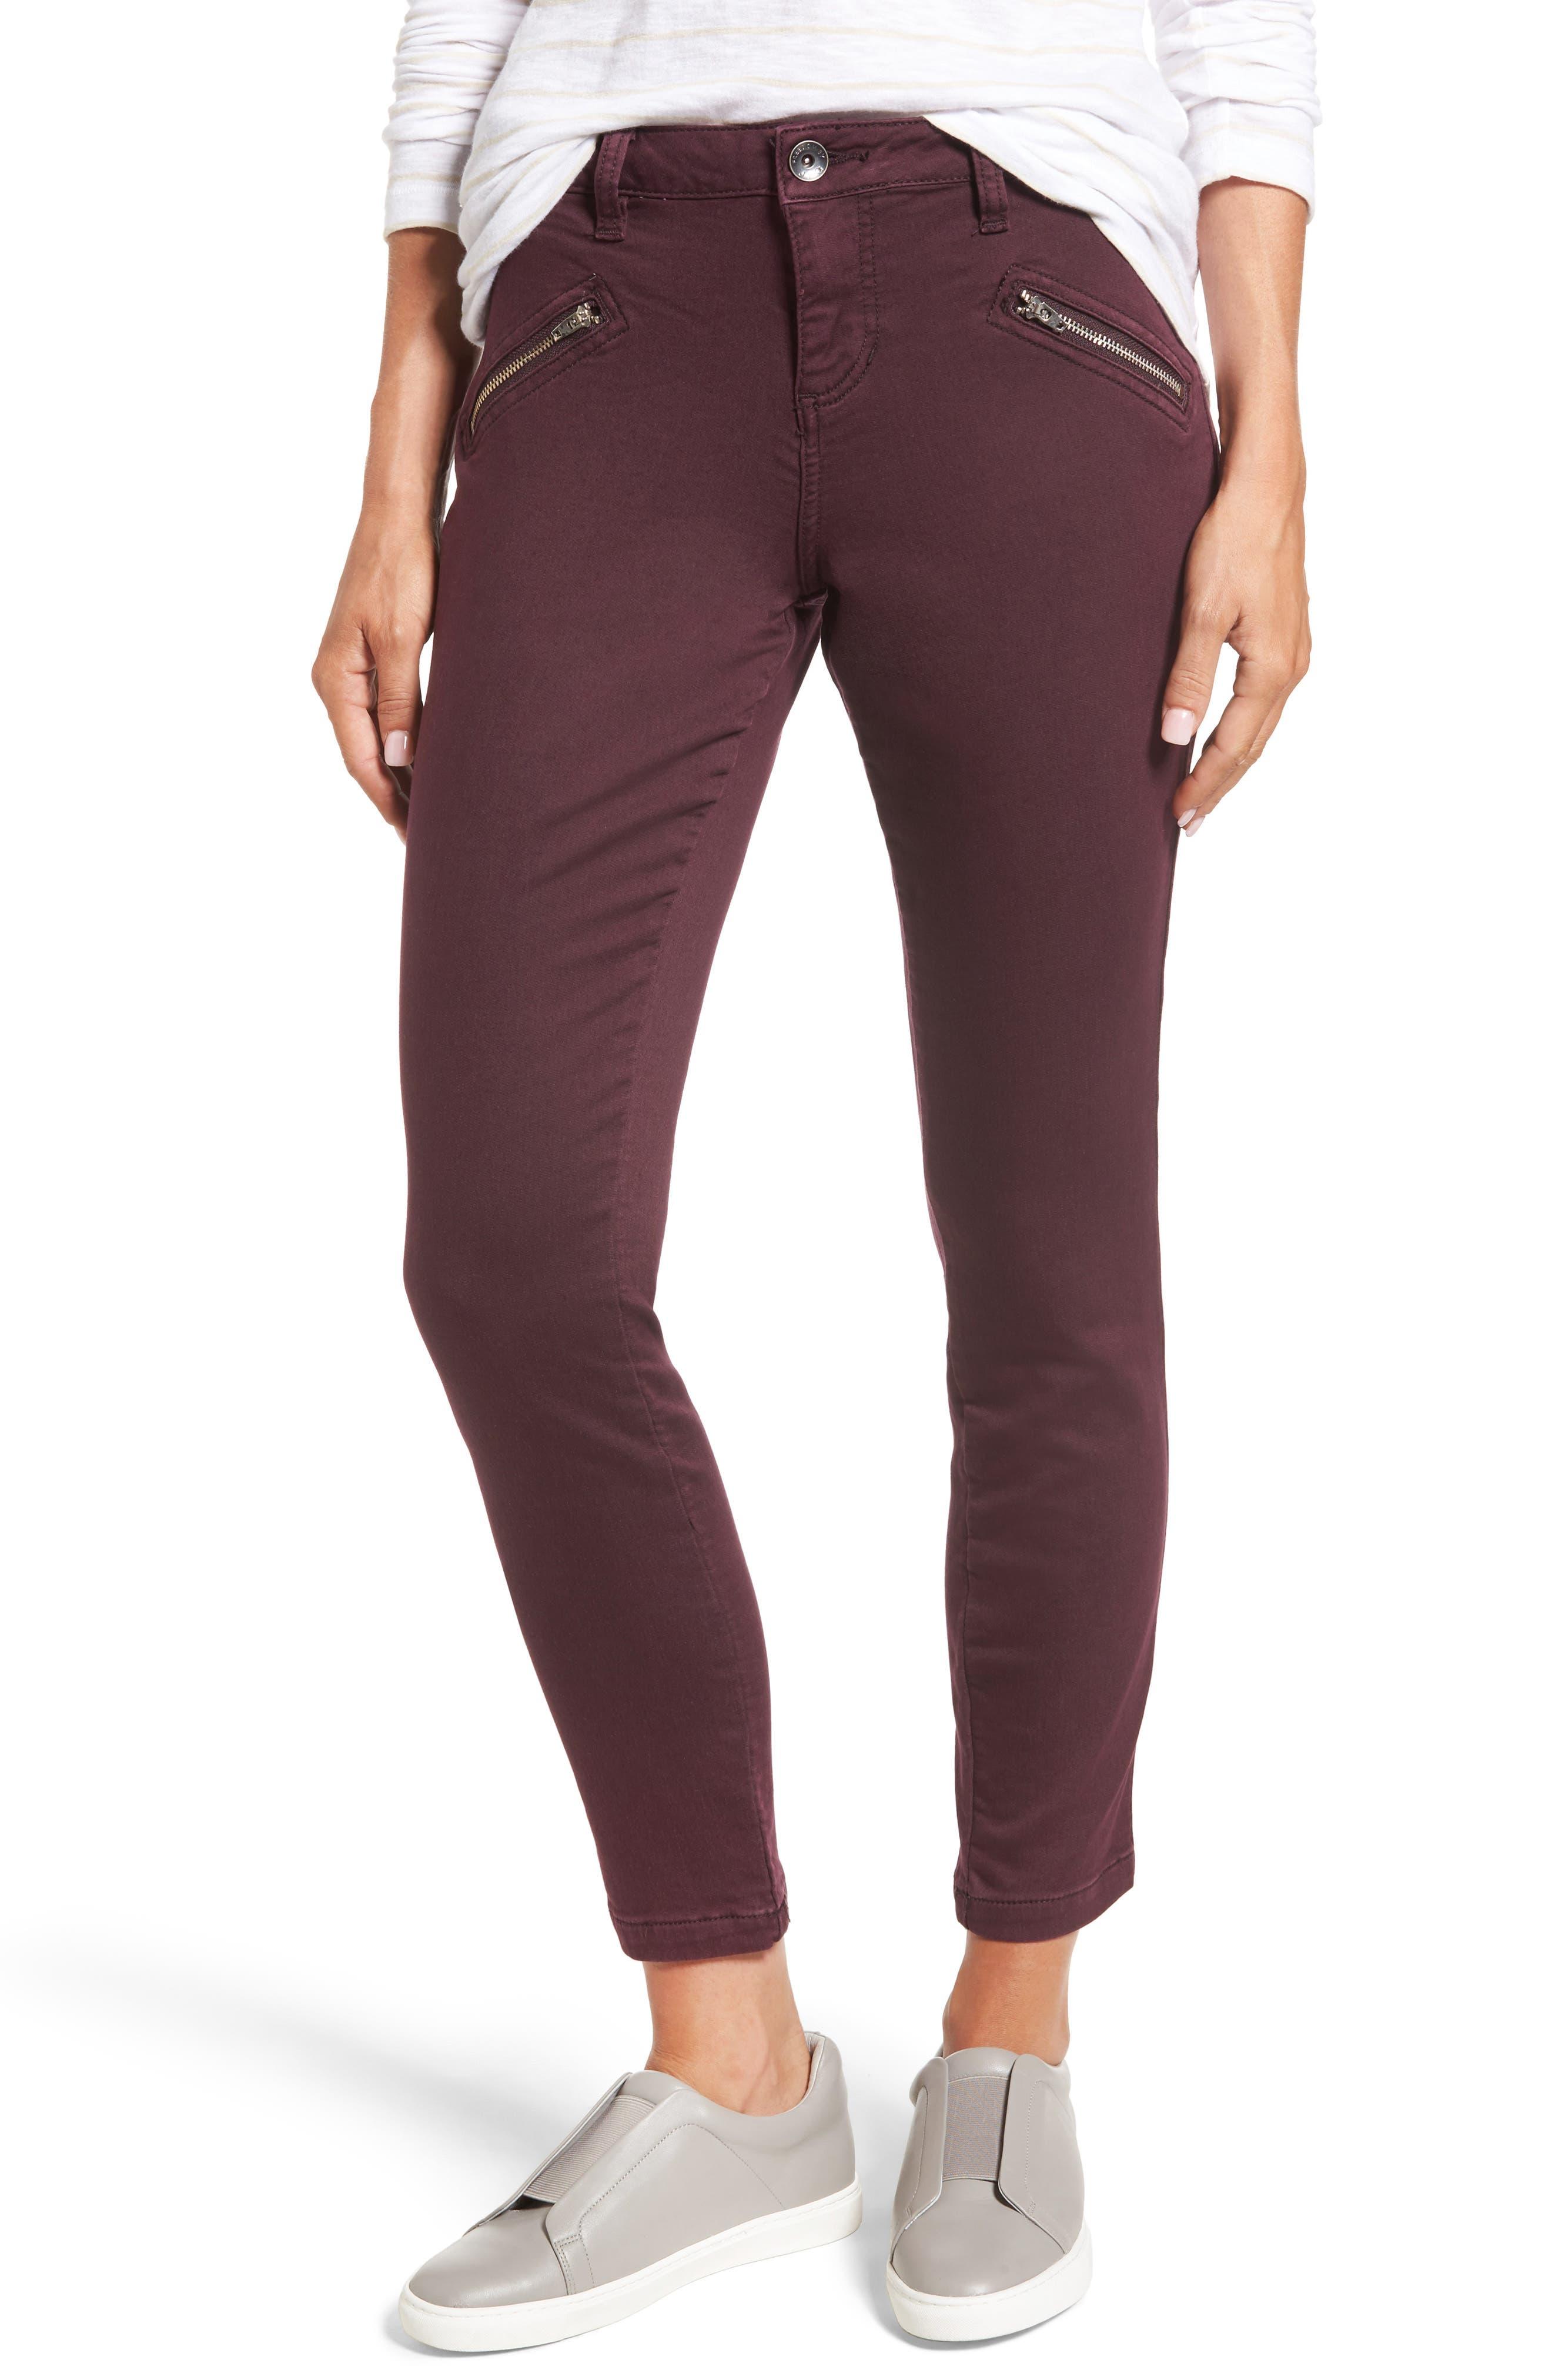 Alternate Image 1 Selected - Jag Jeans Ryan Knit Skinny Jeans (Plum Noir)